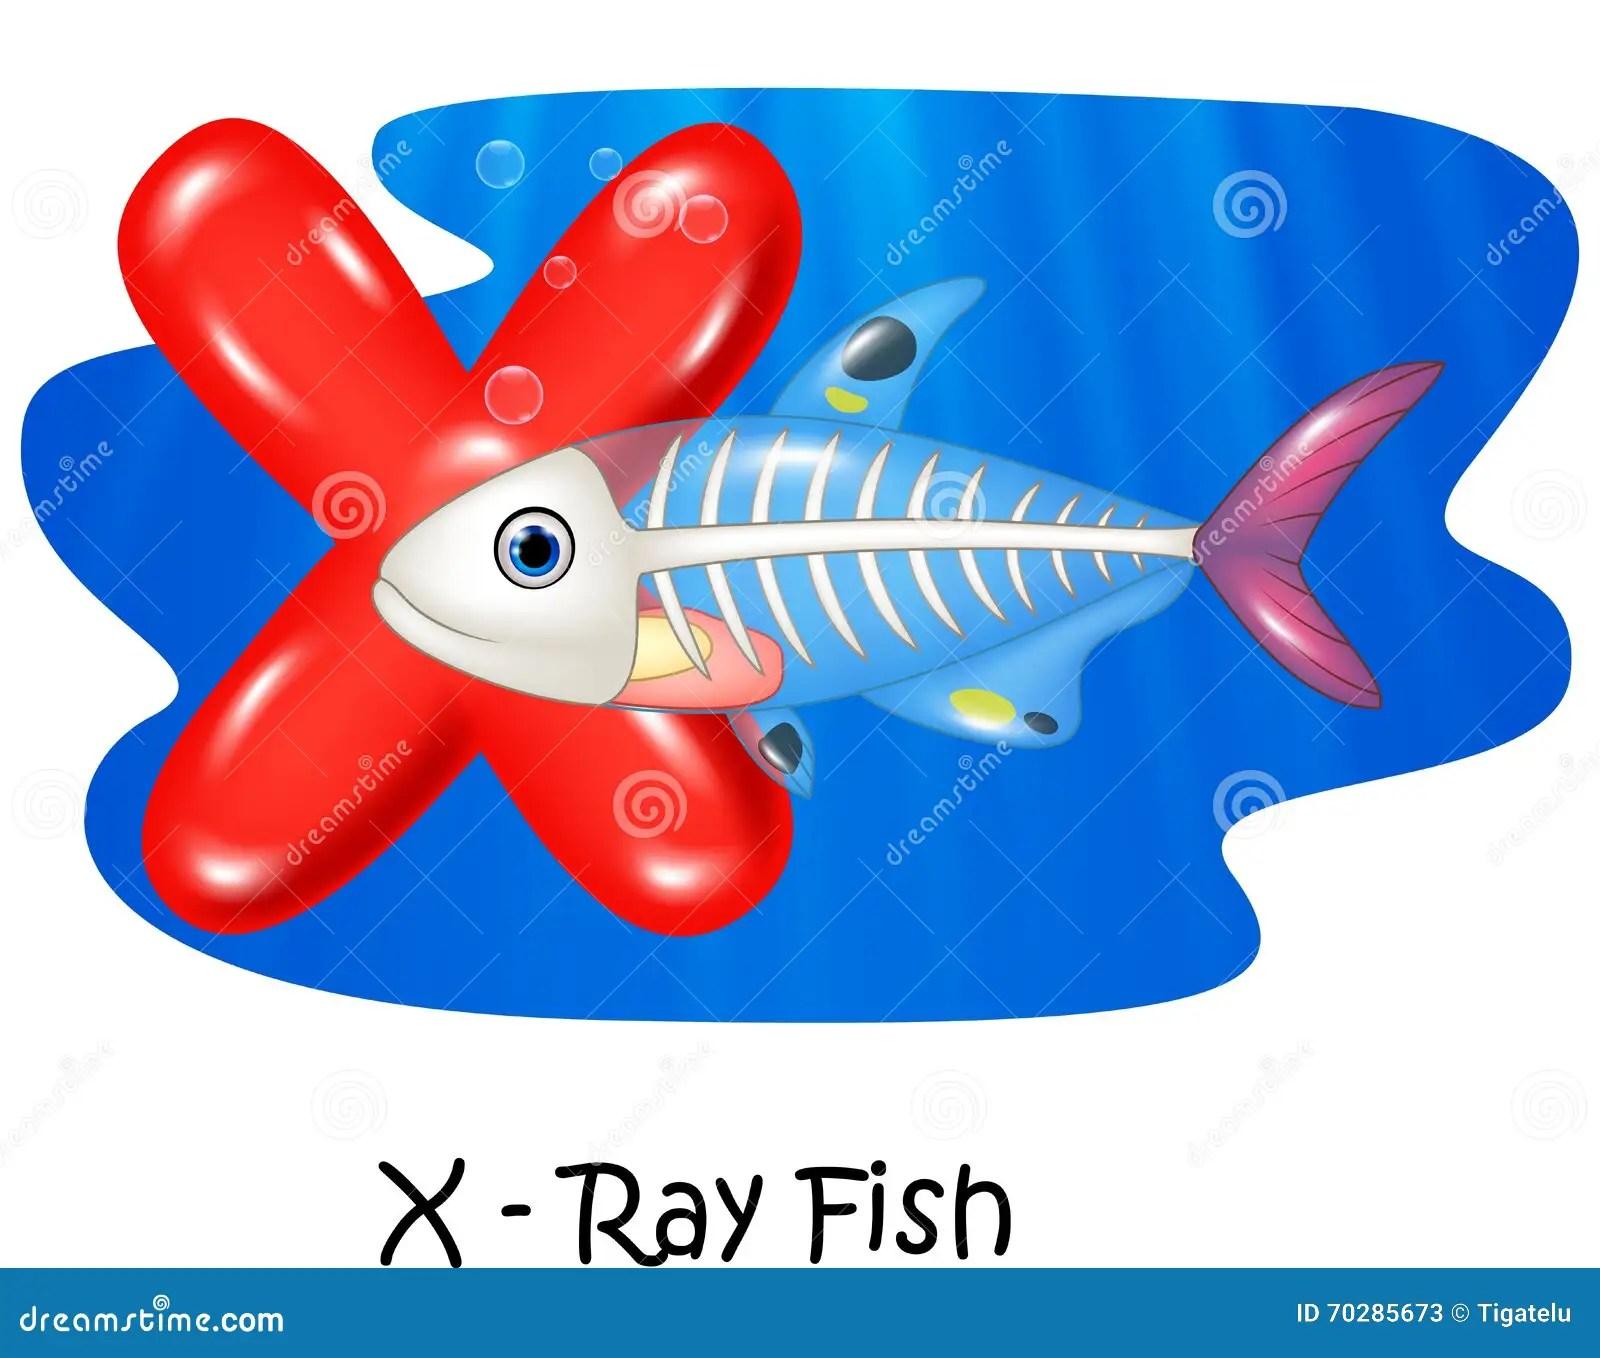 Cartoon Illustration X Of Letter X Ray Fish Stock Vector